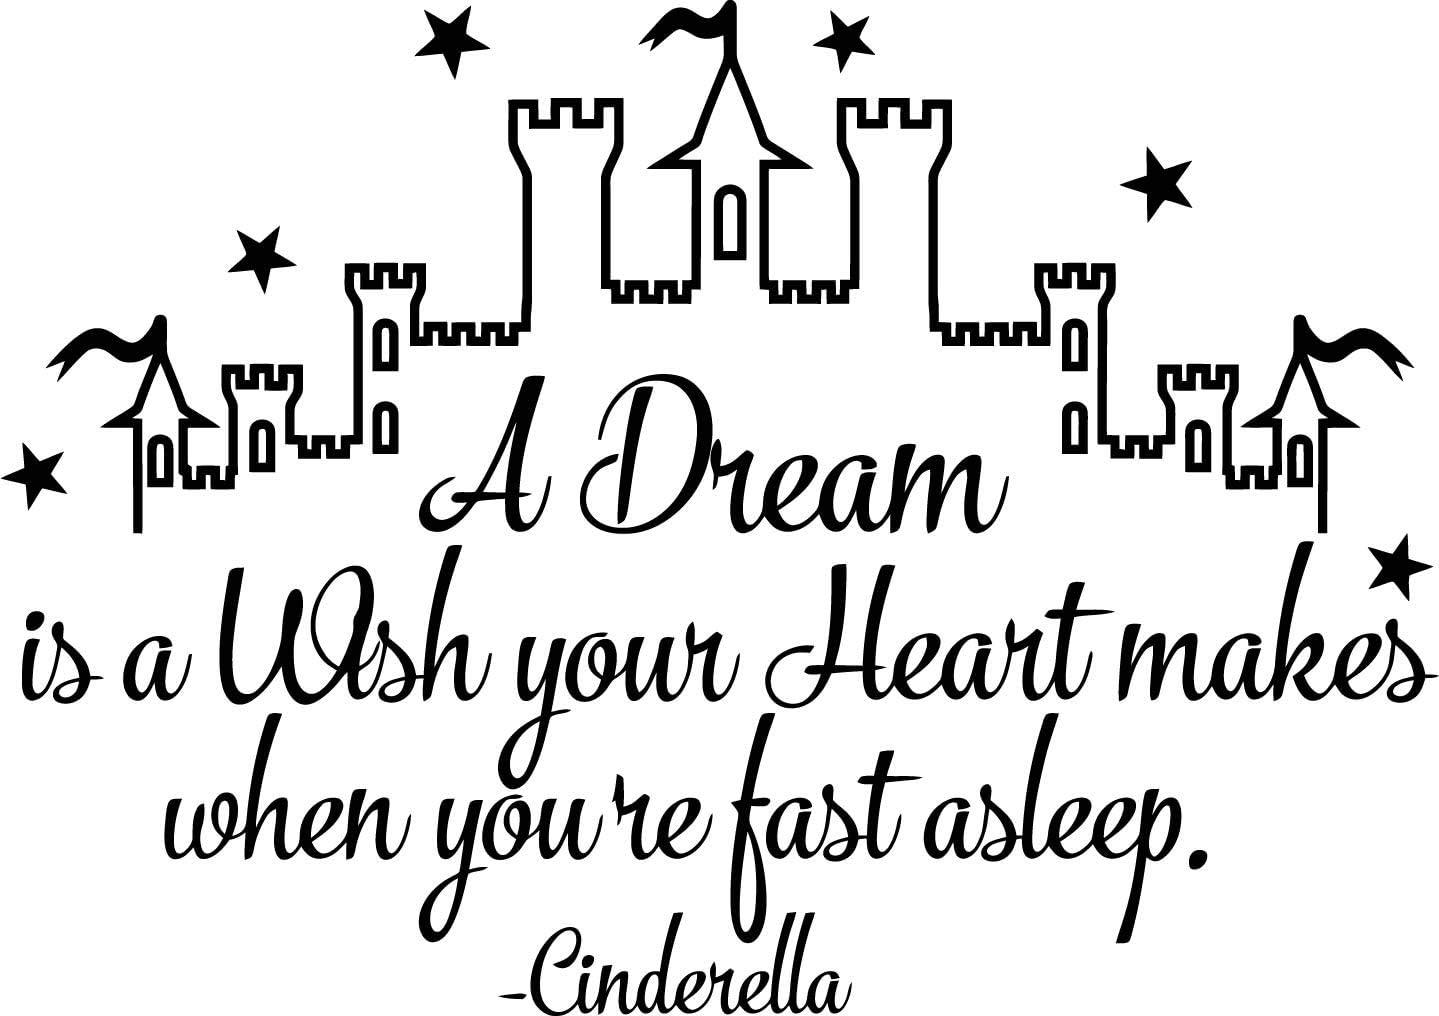 Cinderella Wall Decals Cinderella Quotes Sign Walt Disney Castle Fairy Decor Nursery Baby Quote Girl Gift Stencil Vinyl Sticker Home Girl Bedroom Decor Art Disney Poster Mural Custom Print 871